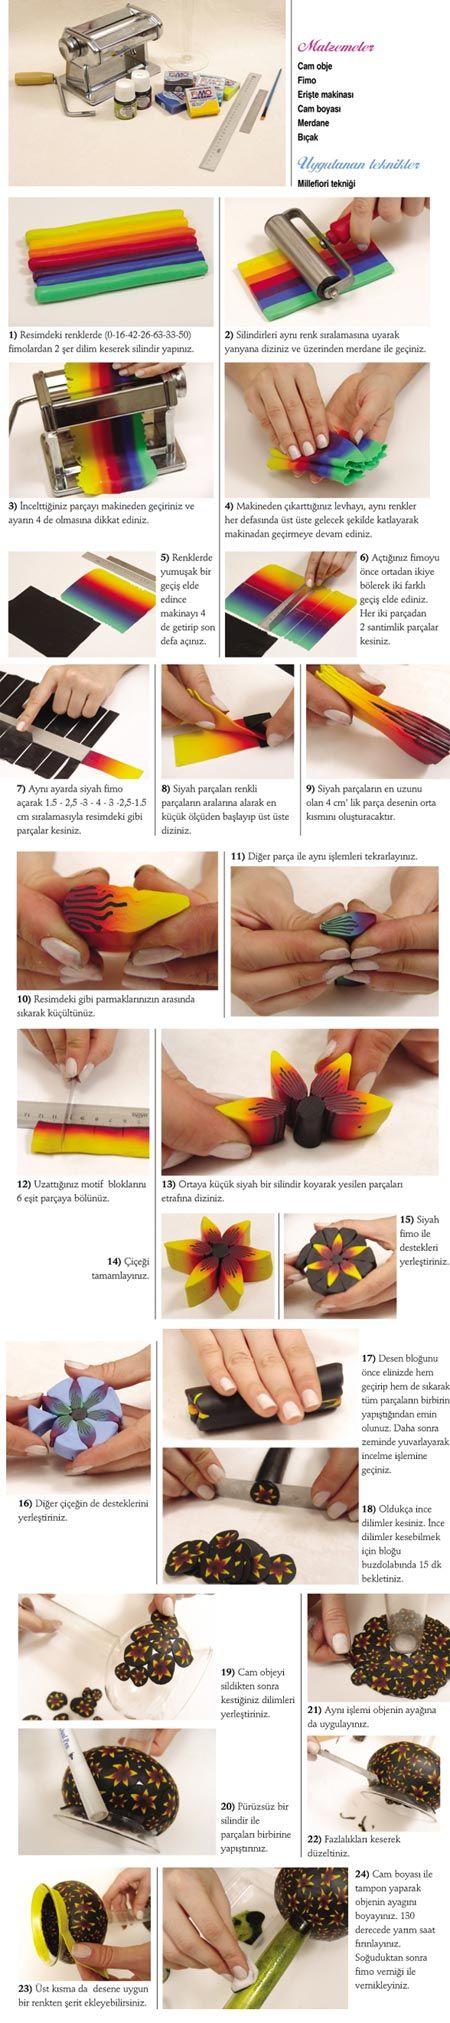 polymer clay rainbow tutorial +other stuff